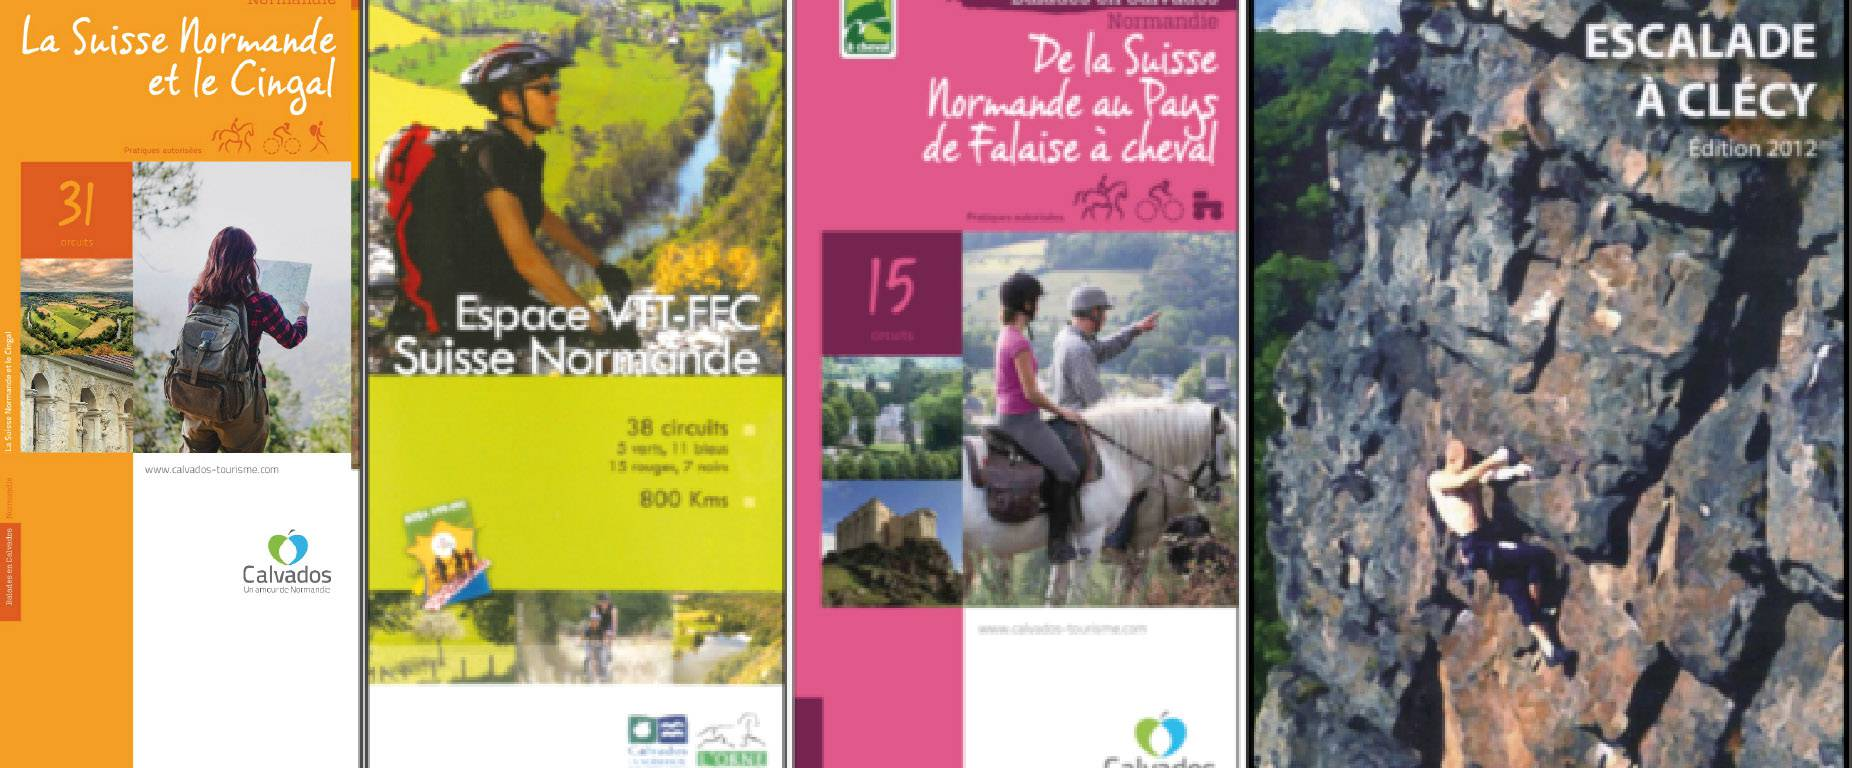 Calendrier Randonnee Pedestre Calvados.Topoguides Office De Tourisme De La Suisse Normande